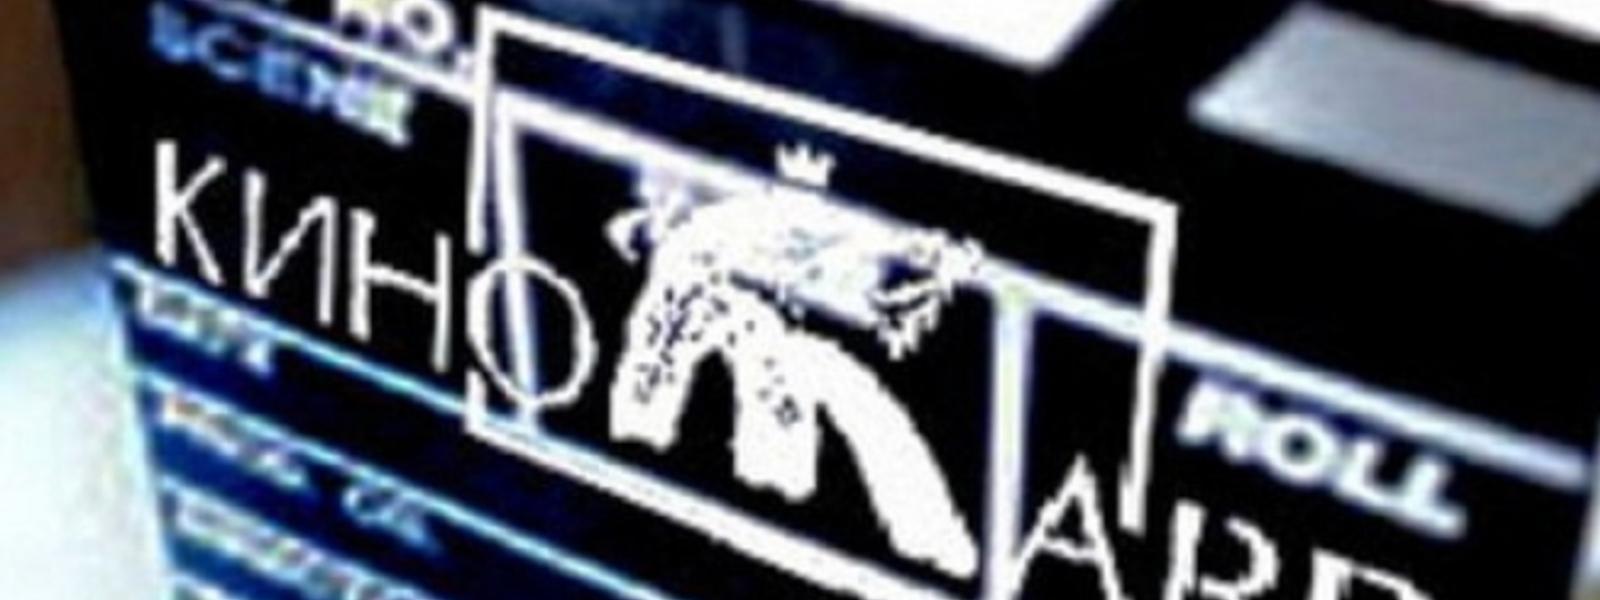 "Photo of Назван фильм-победитель фестиваля ""Кинотавр"" Назван фильм-победитель фестиваля ""Кинотавр"" Назван фильм-победитель фестиваля ""Кинотавр"" single 315df05b9d"